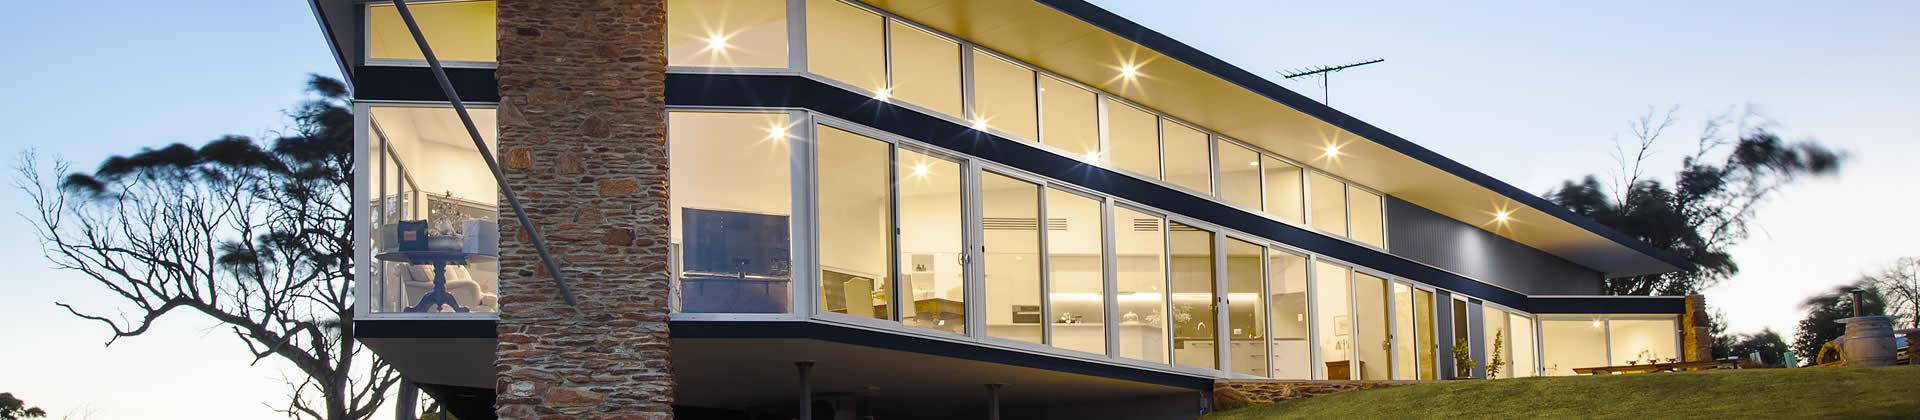 Storefront Windows And Doors ecoframeplus 101.6mm centre pocket double glazed framing